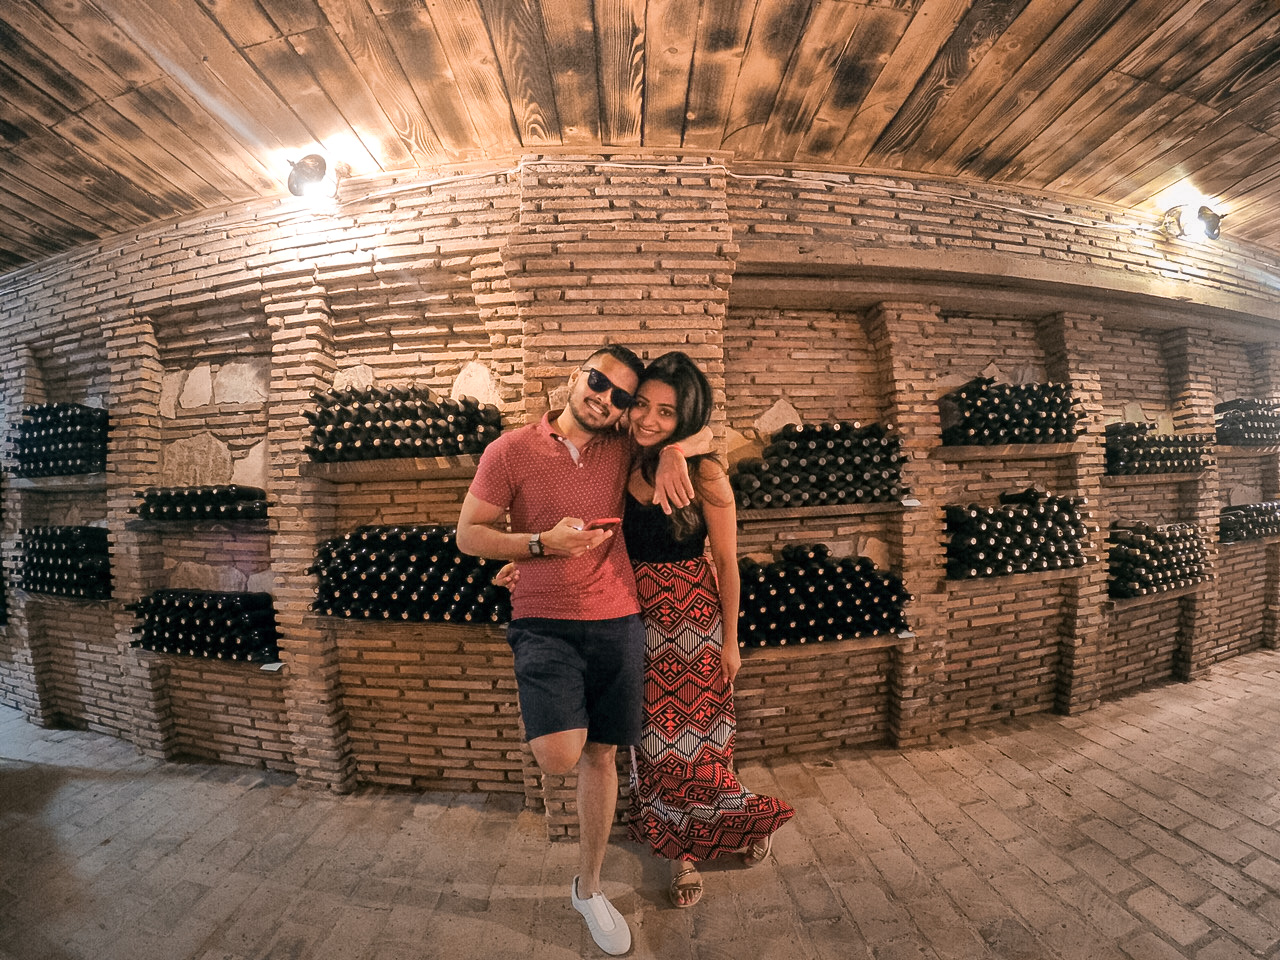 Hotel Twins Wine Cellar in Kakheti, Georgia